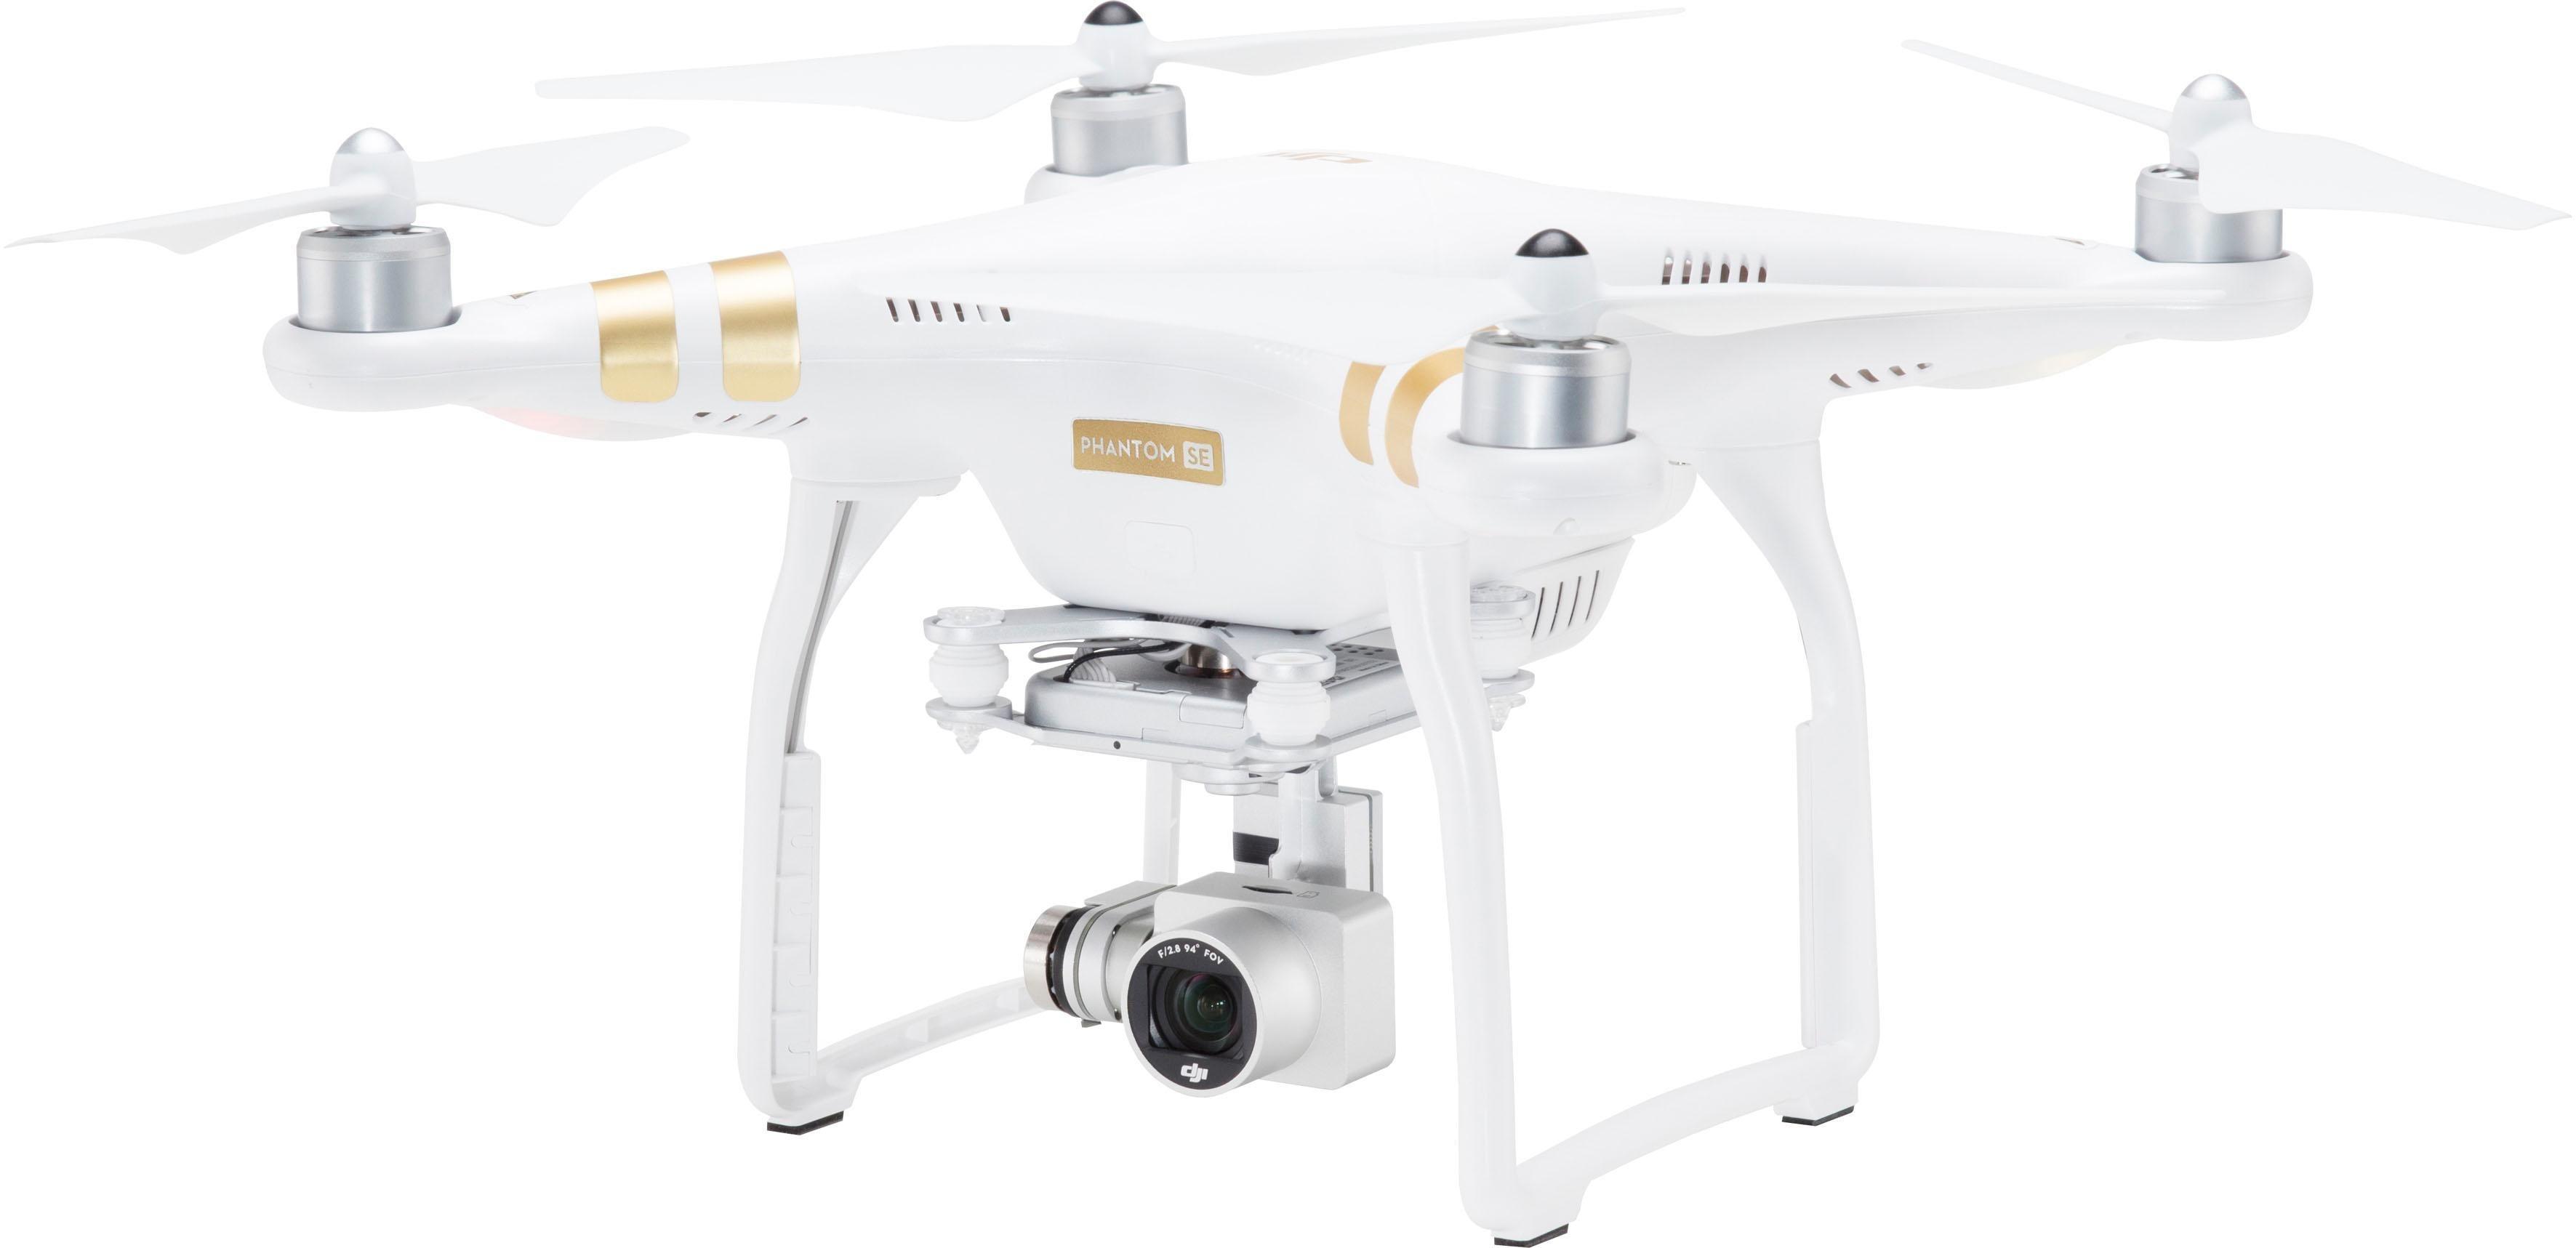 Drohne »Phantom 3 SE«